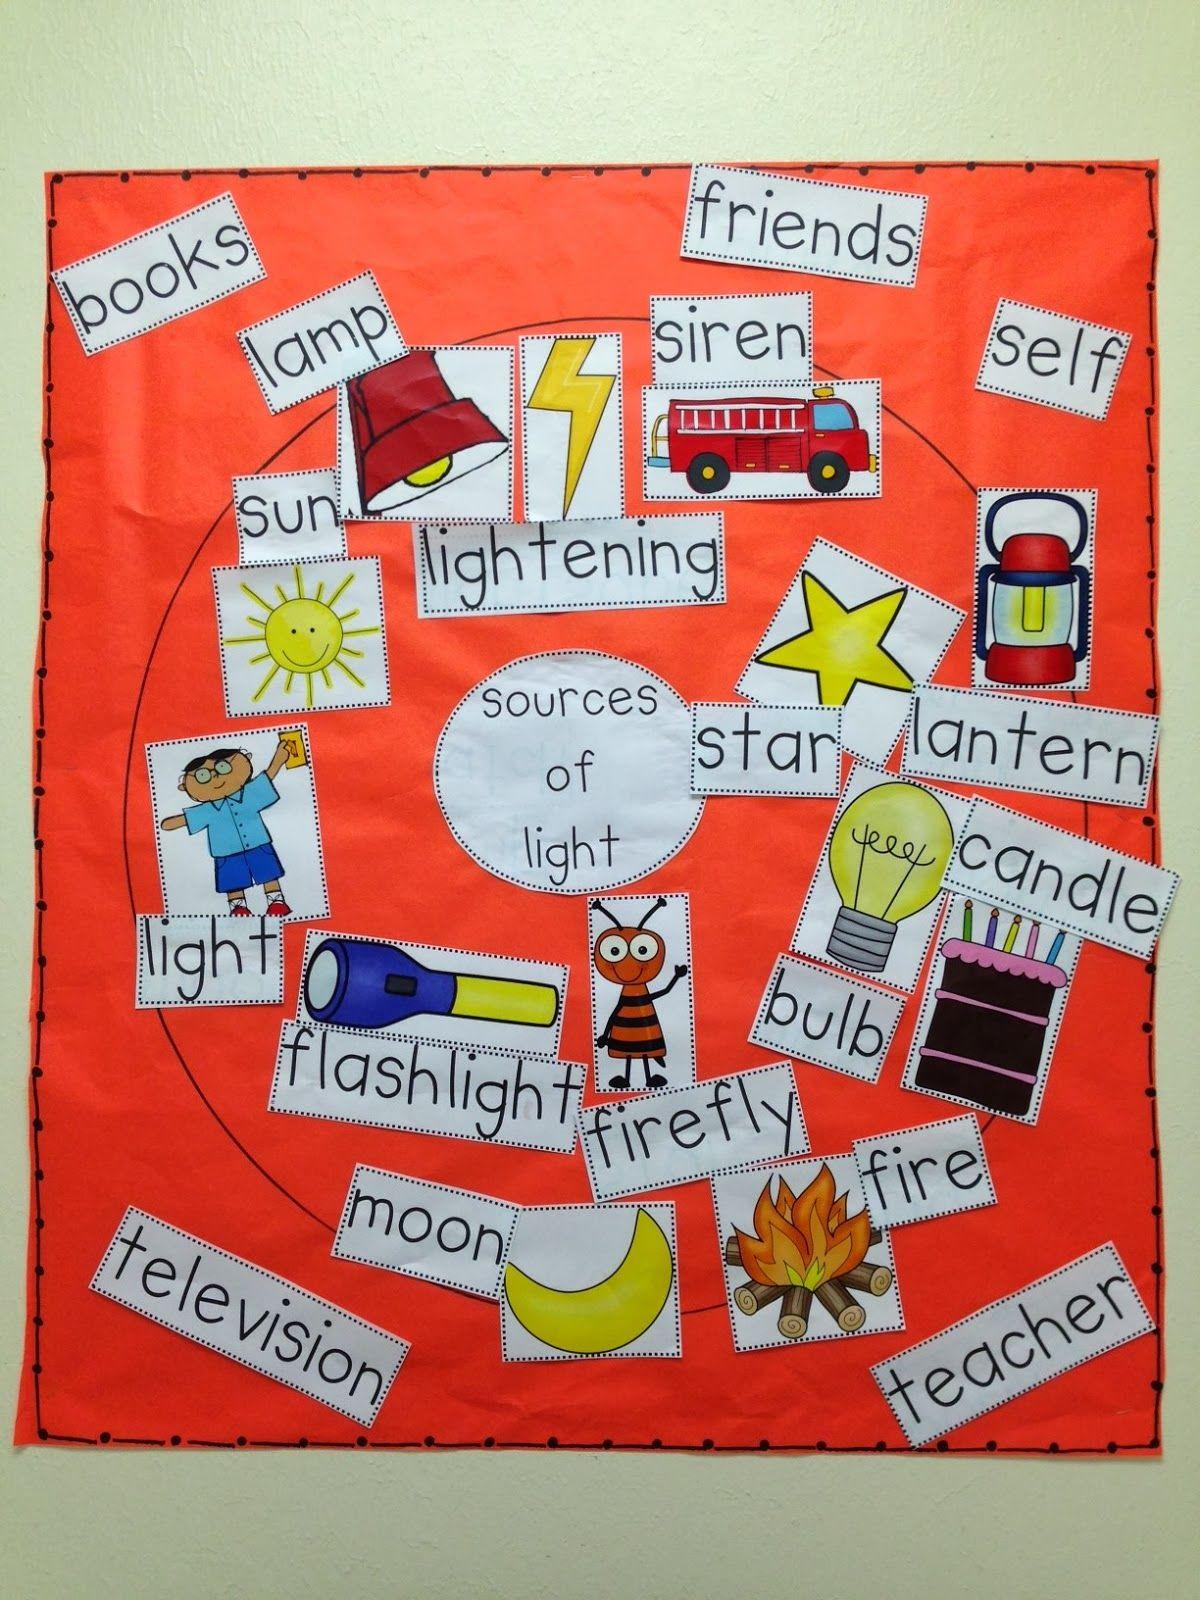 Sources Of Light Light Science Kindergarten Science First Grade Science [ 1600 x 1200 Pixel ]